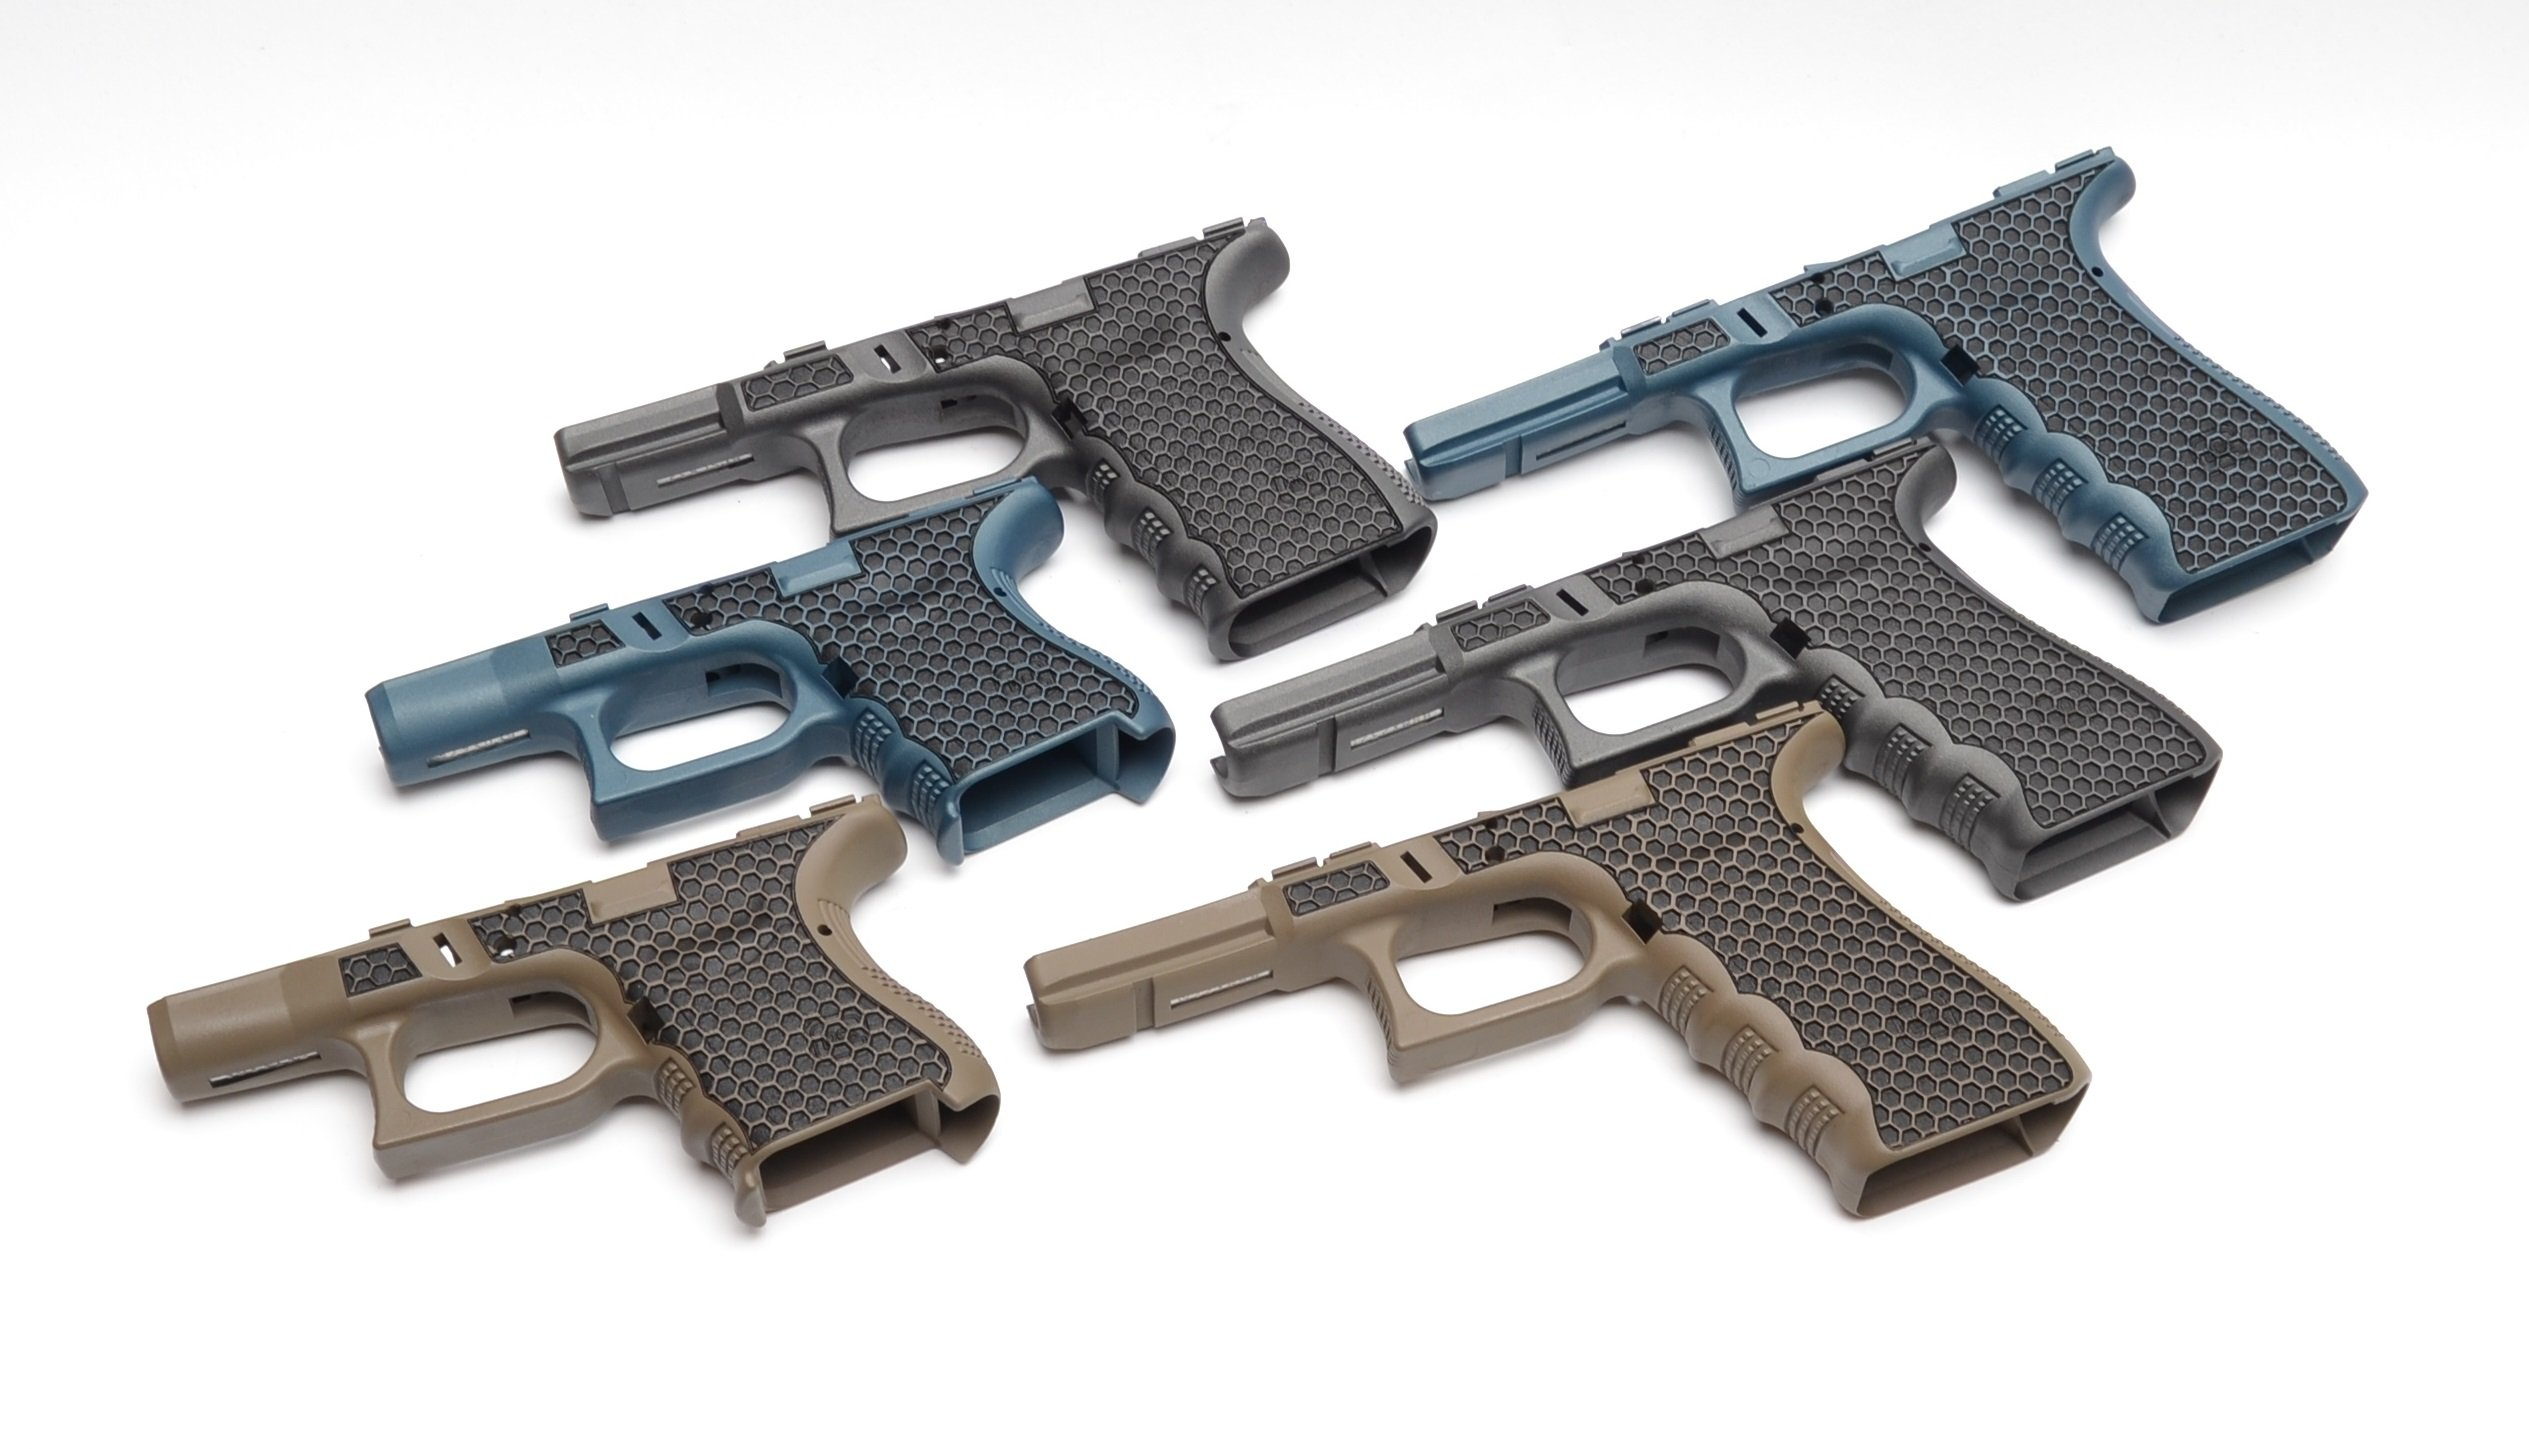 bd8b92870d5  100 off All Glock Frames (Cerakote   Stippled) -  149